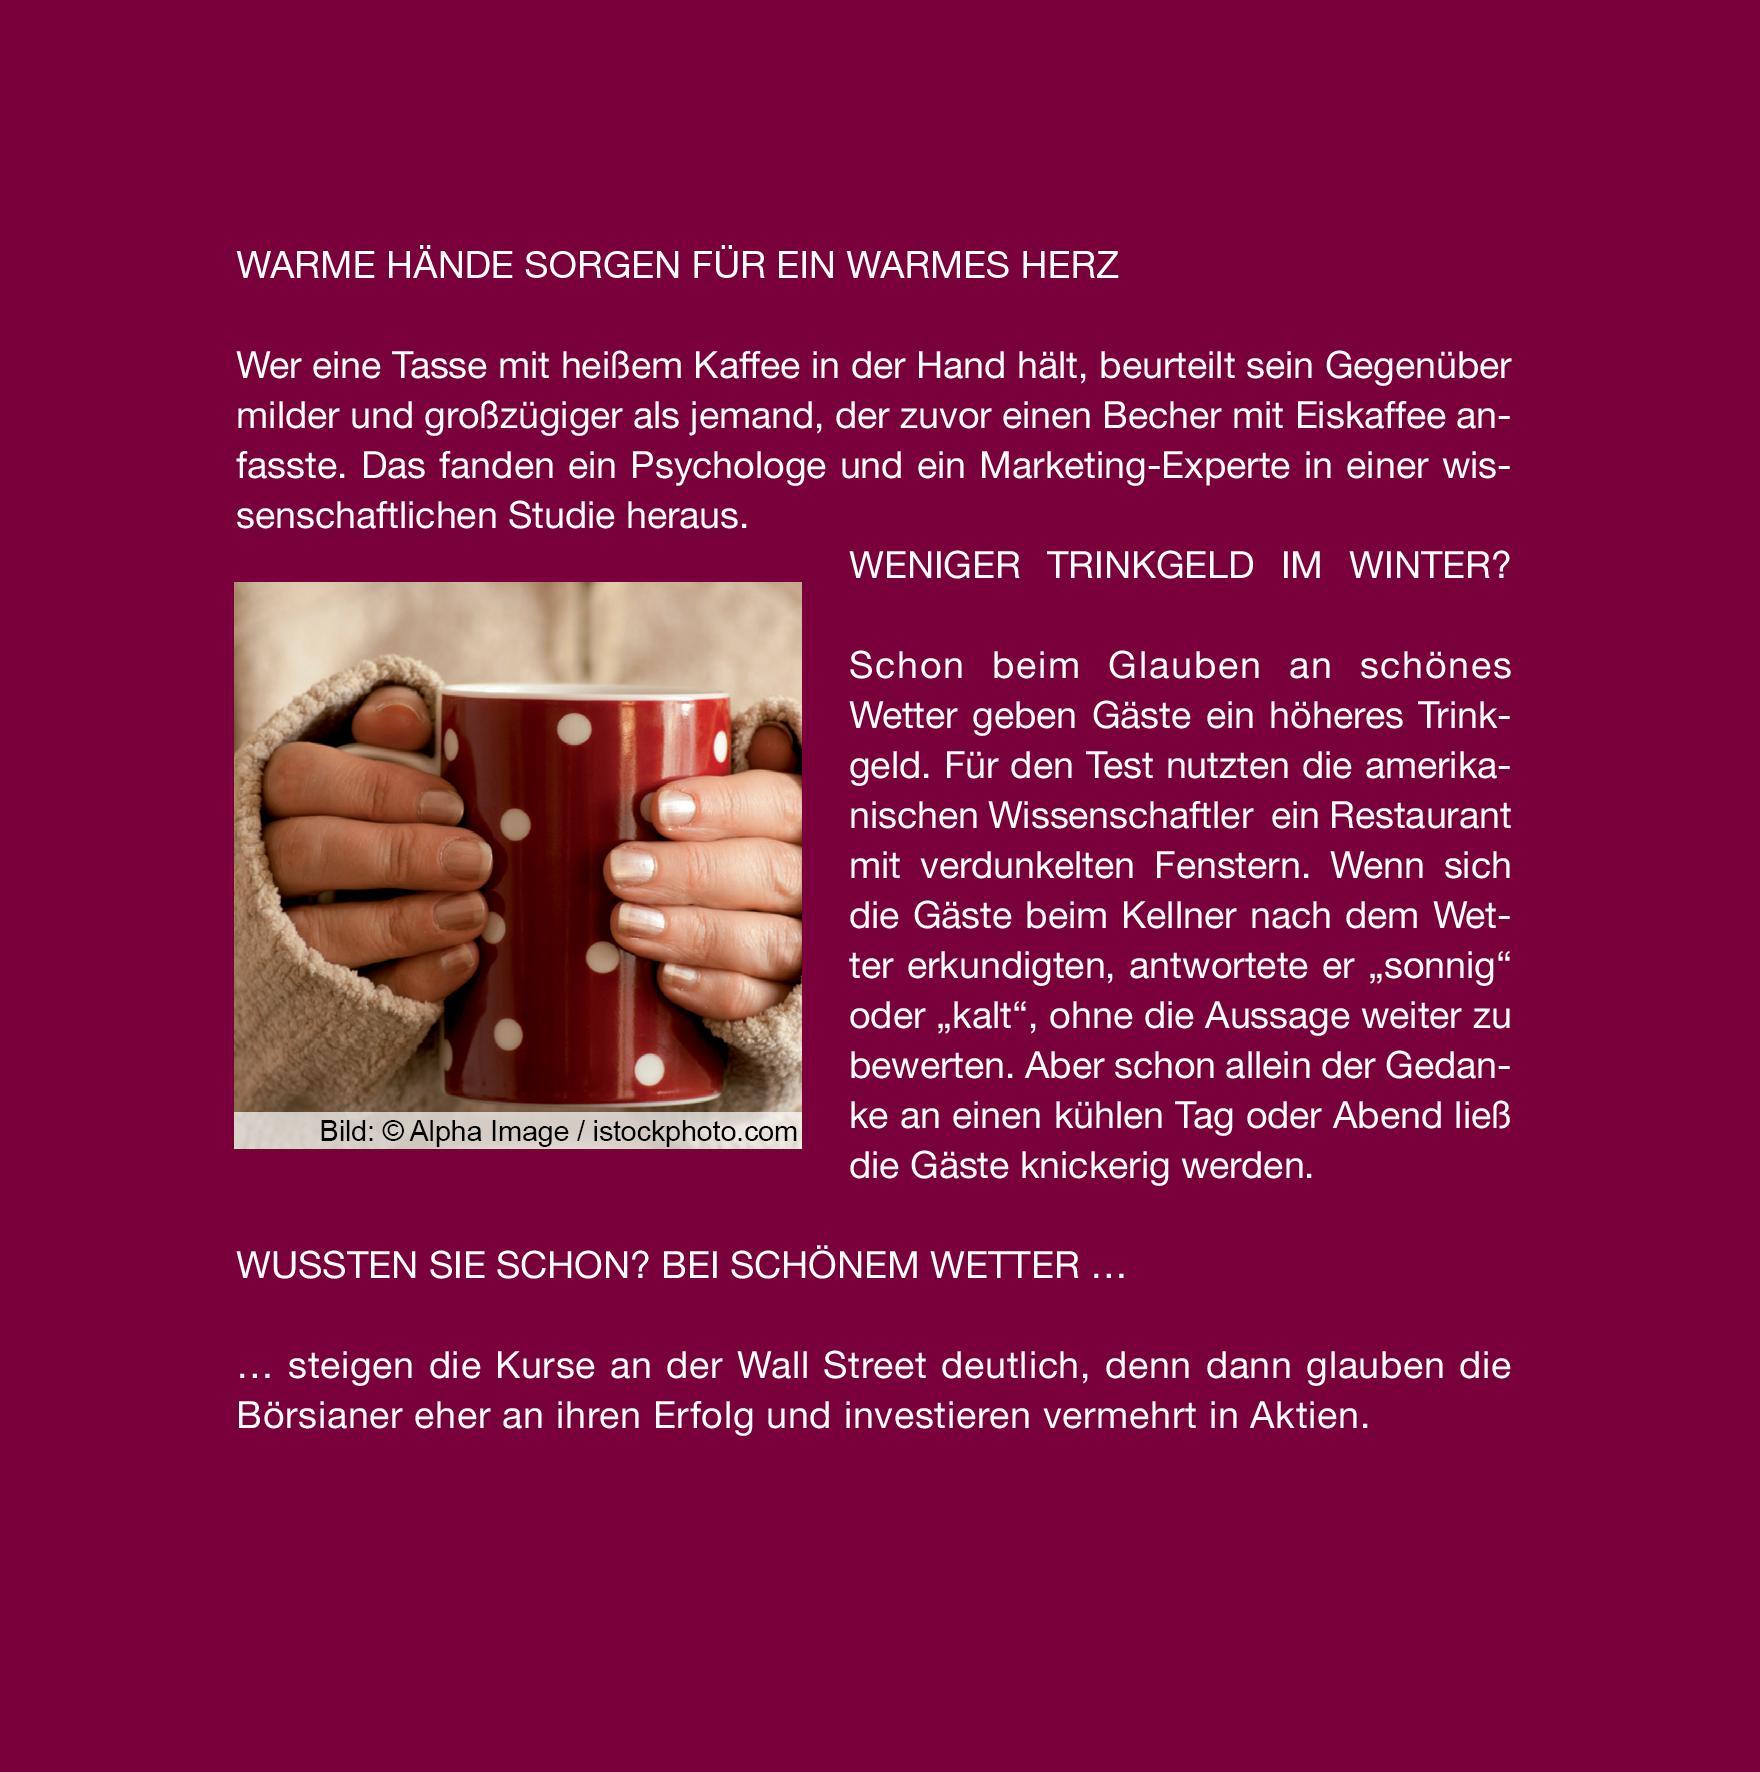 Atemberaubend Große Drahtmuttern Bilder - Schaltplan Serie Circuit ...